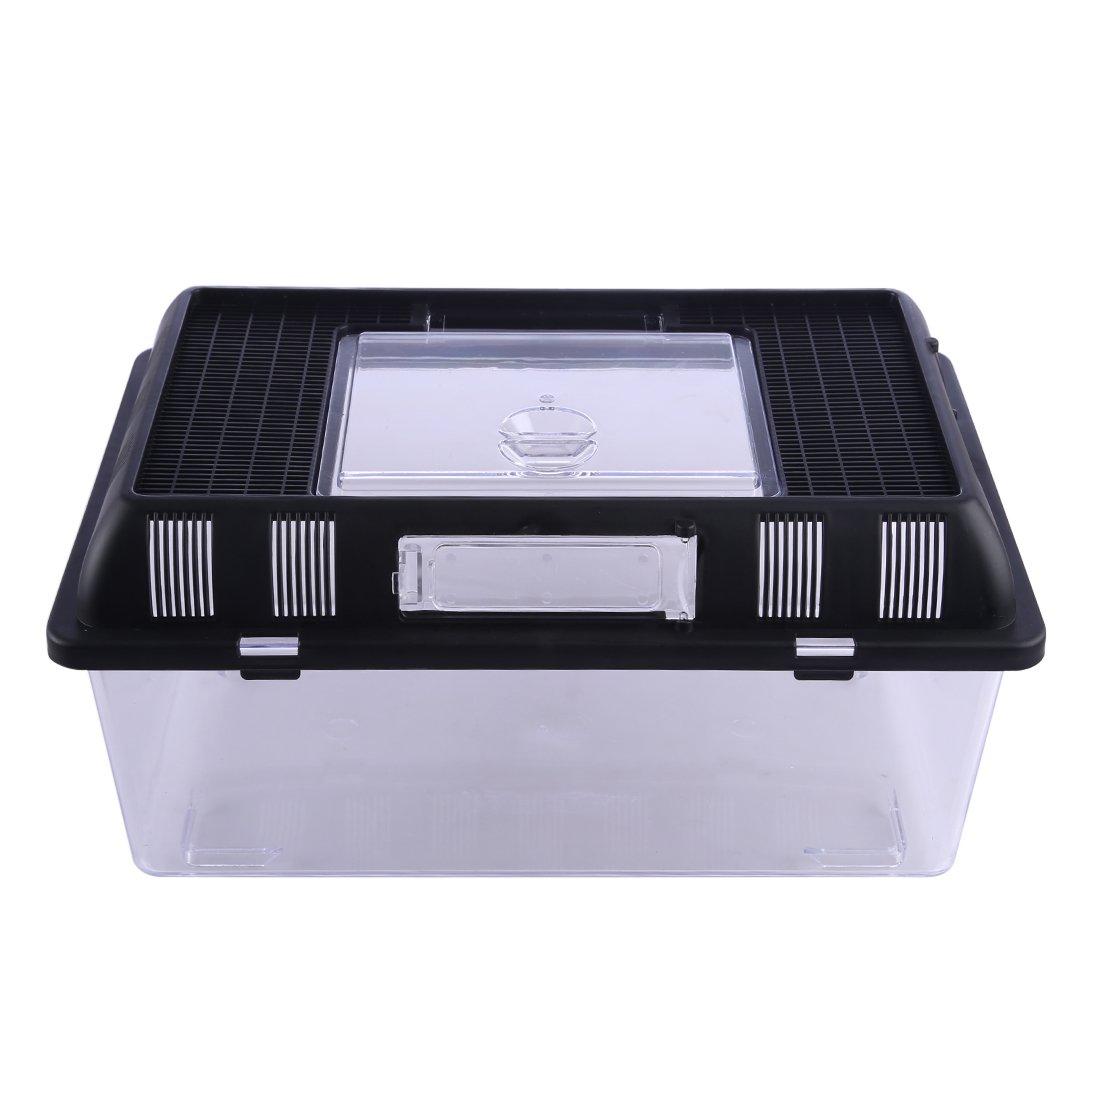 Petforu Breeding Box Crawler Jar Small Reptile Feeding Box Portable Plastic - Rectangle S